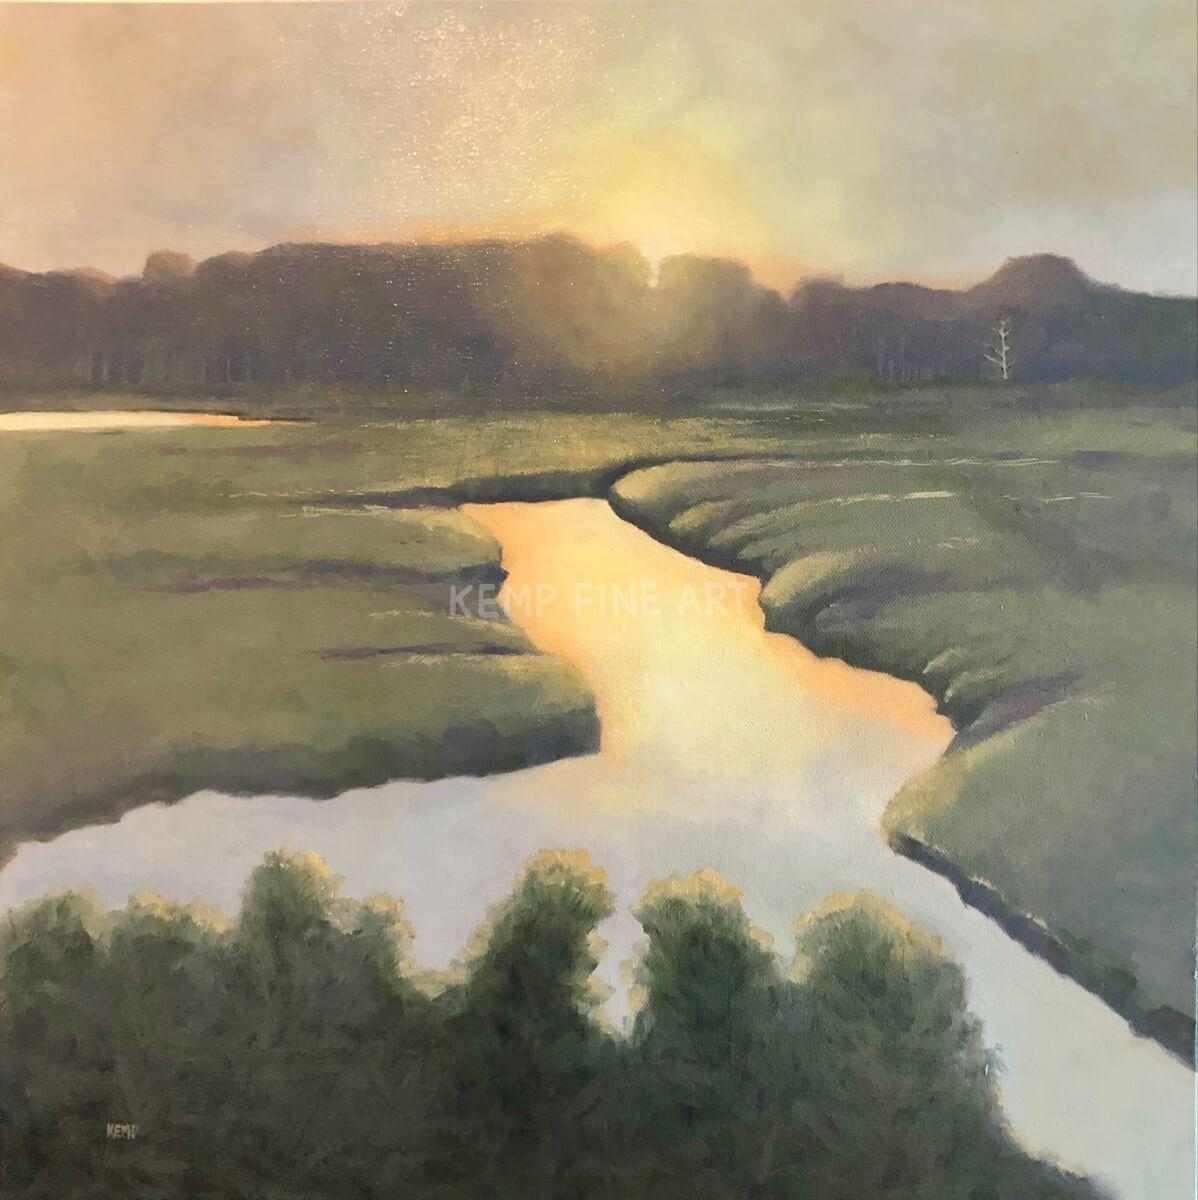 Last Light | Oil on Canvas - by Jim Kemp